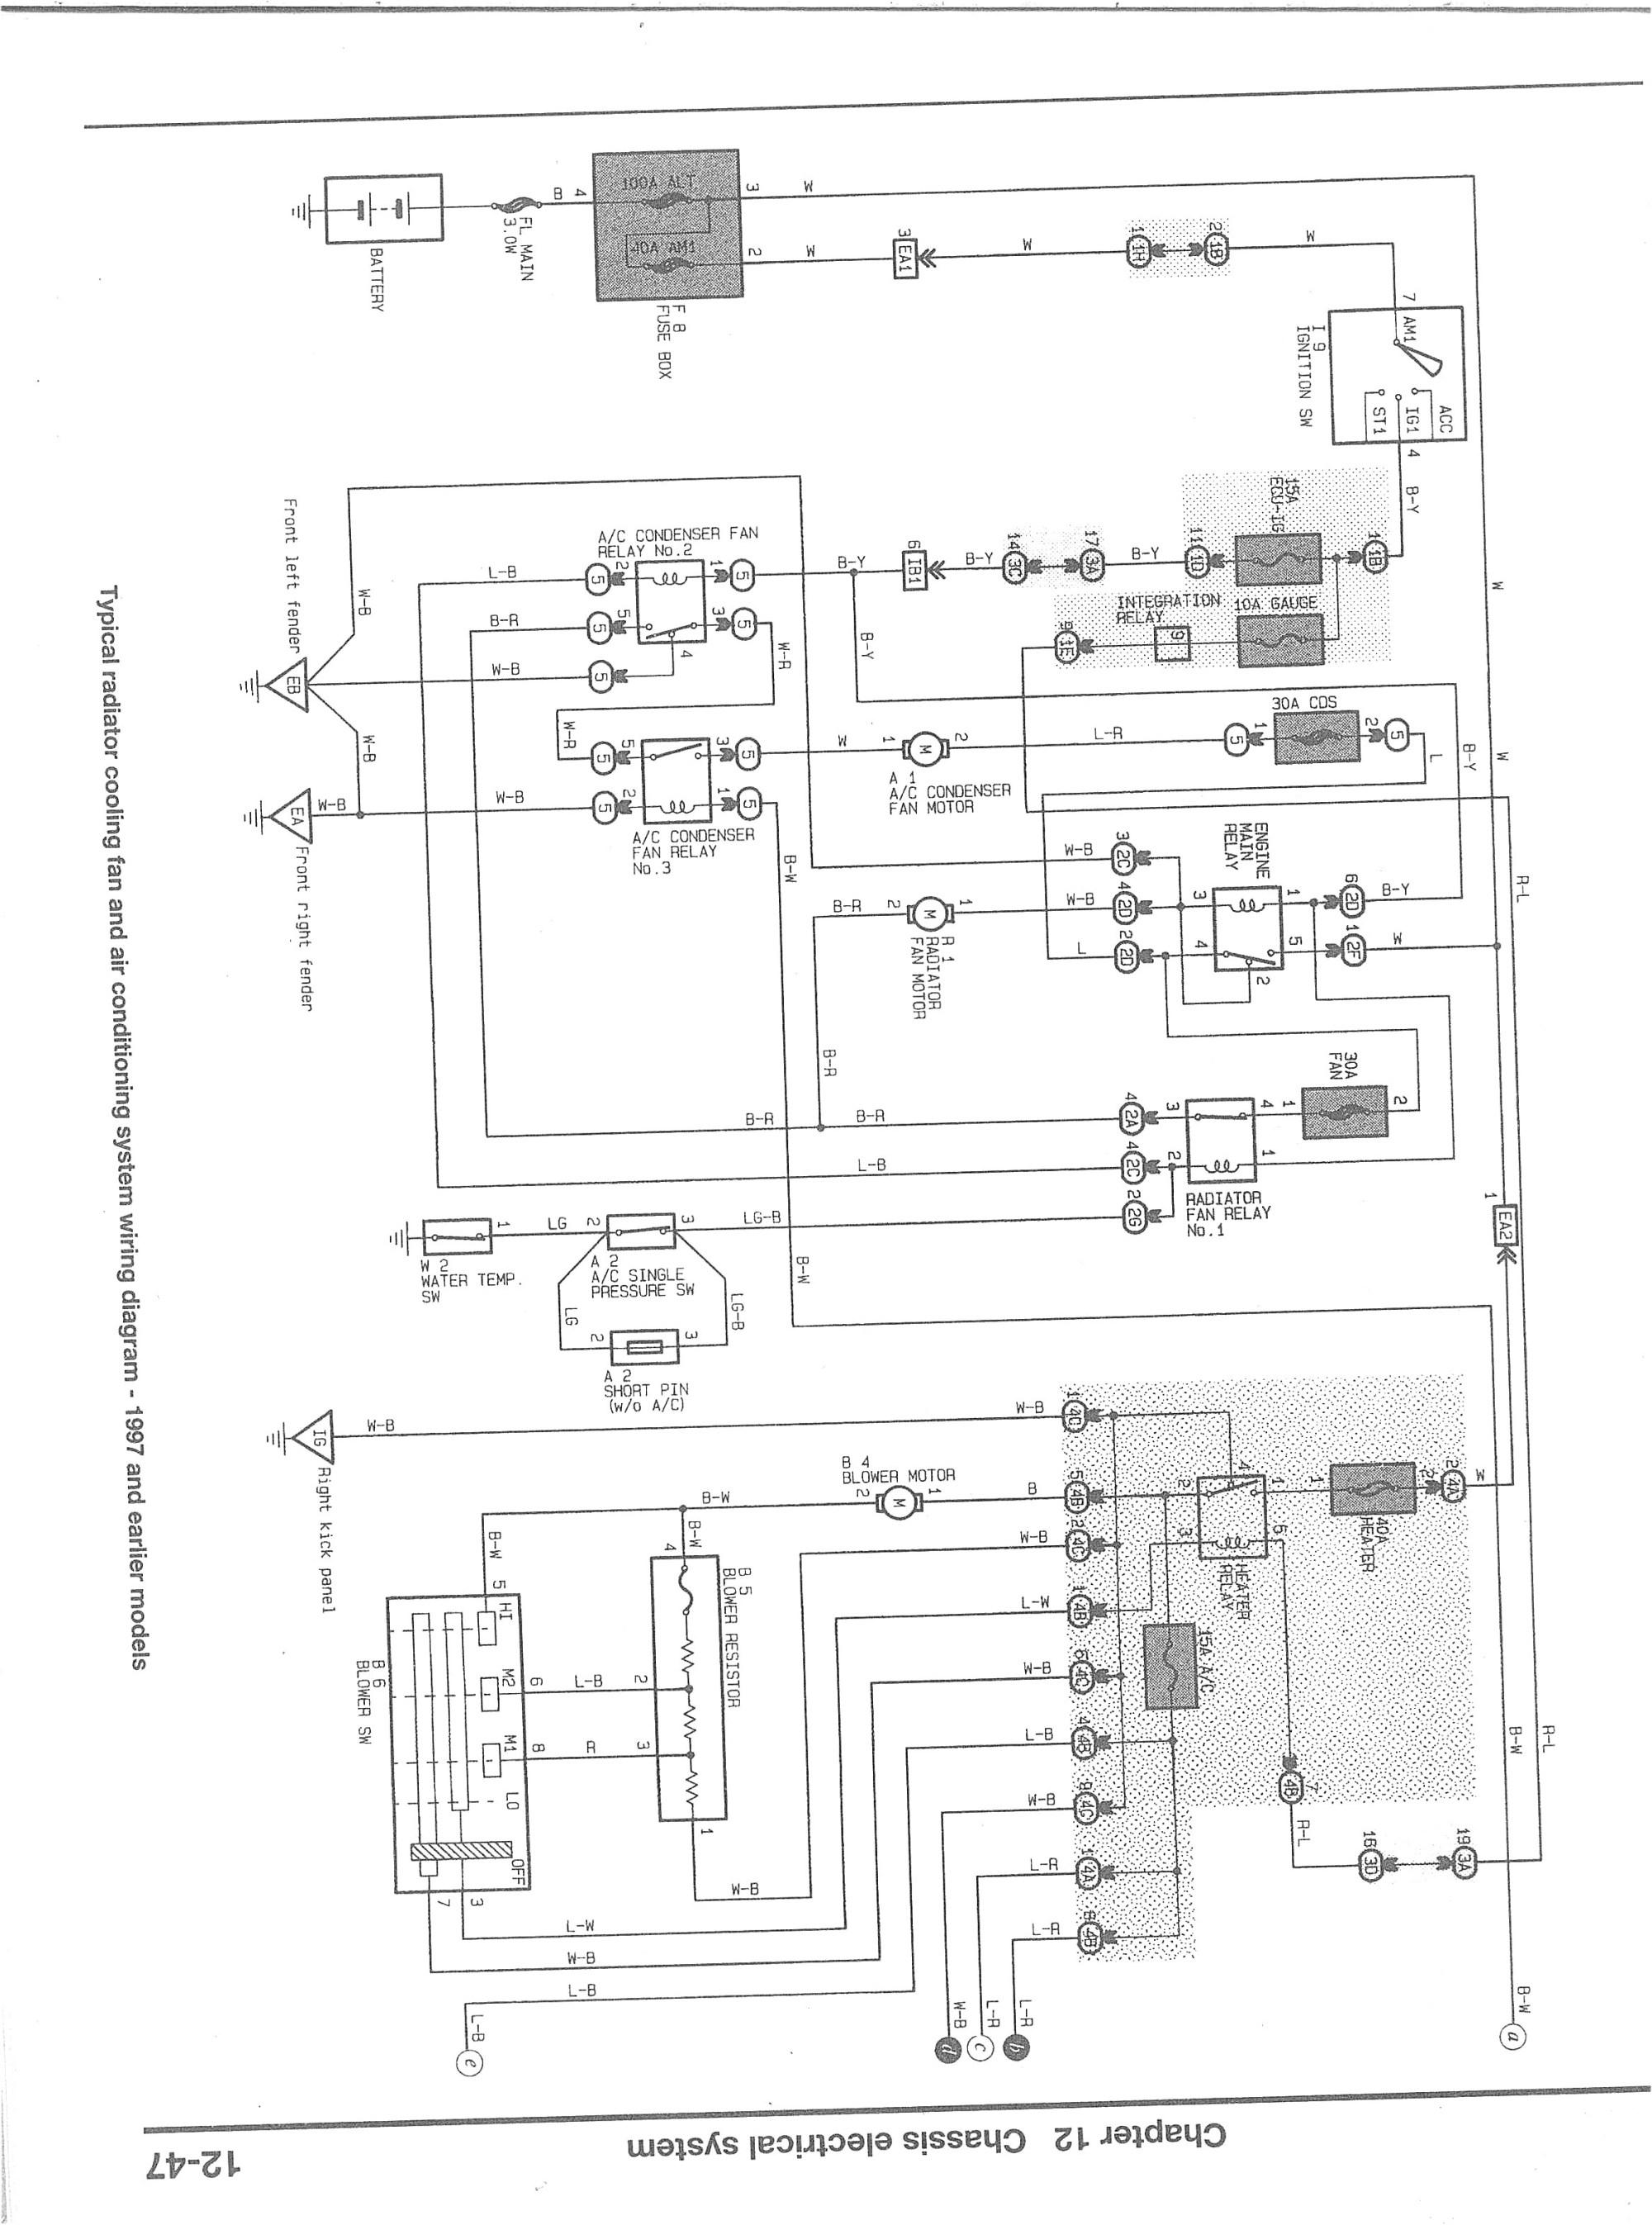 hight resolution of goodman air handler wiring diagram goodman air handler wiring diagram new goodman air handler wiring